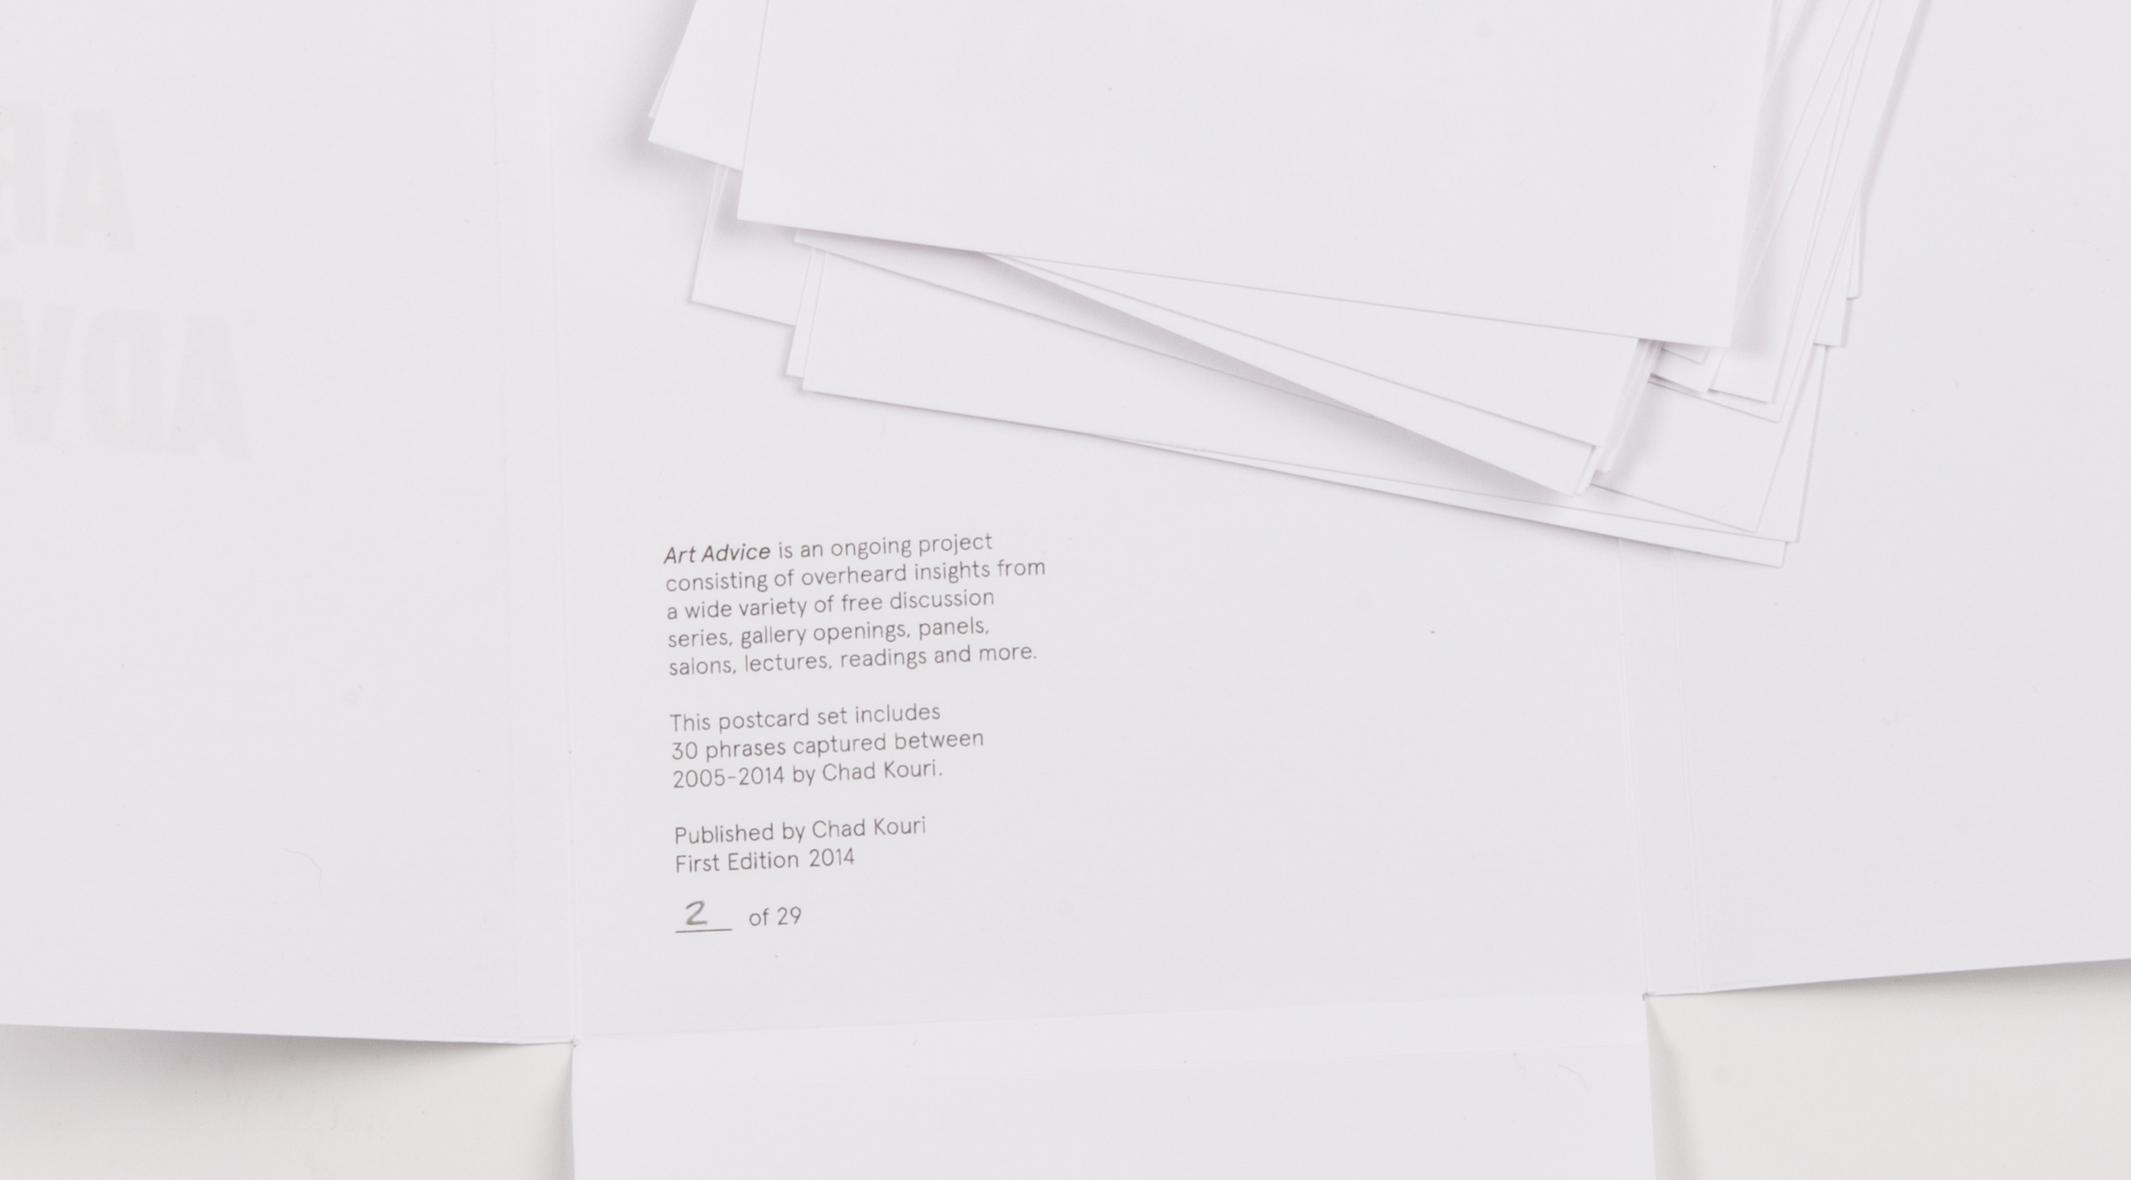 chadkouri-artadvicepostcards-creditopen-detail